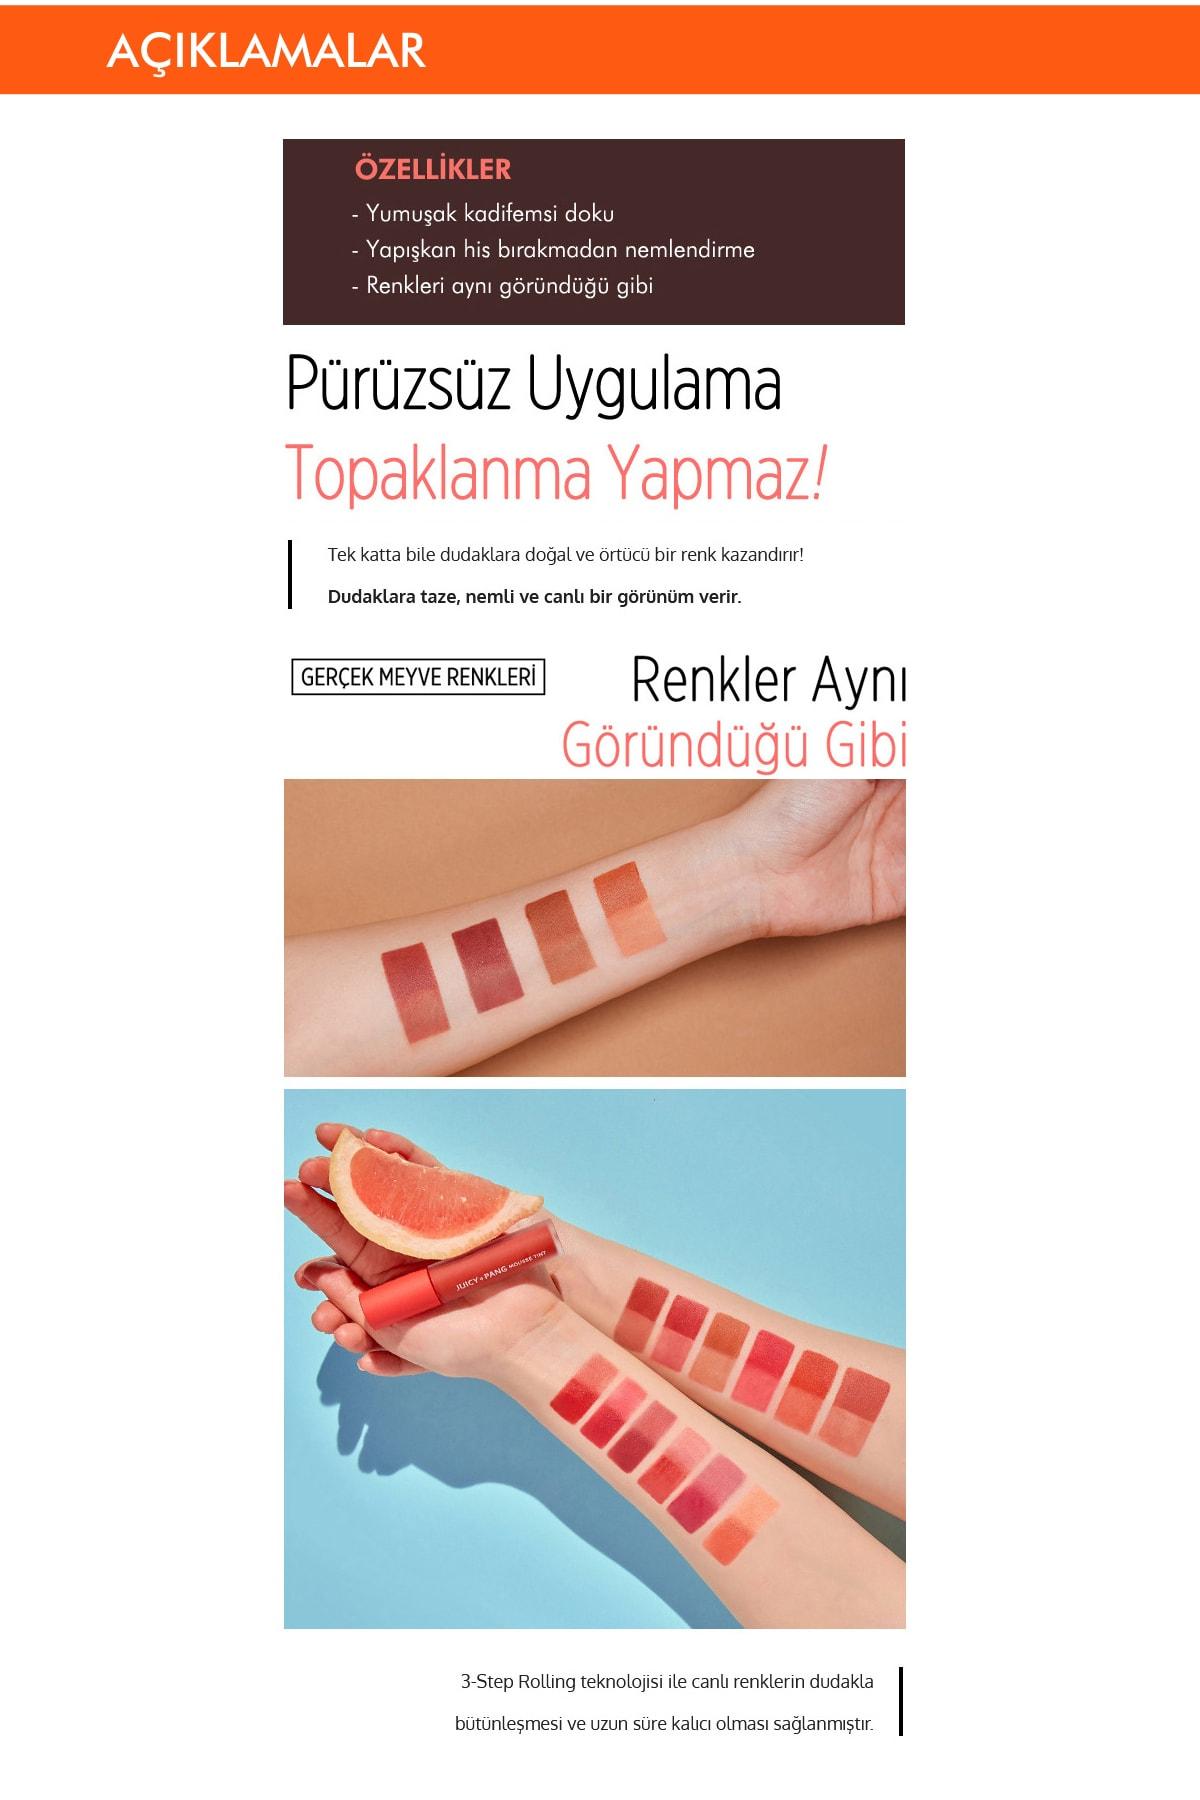 Missha Pürüzsüz Görünüm Sunan Kalıcı Köpük Tint Ruj APIEU Juicy Pang Mousse Tint (RD04) 3